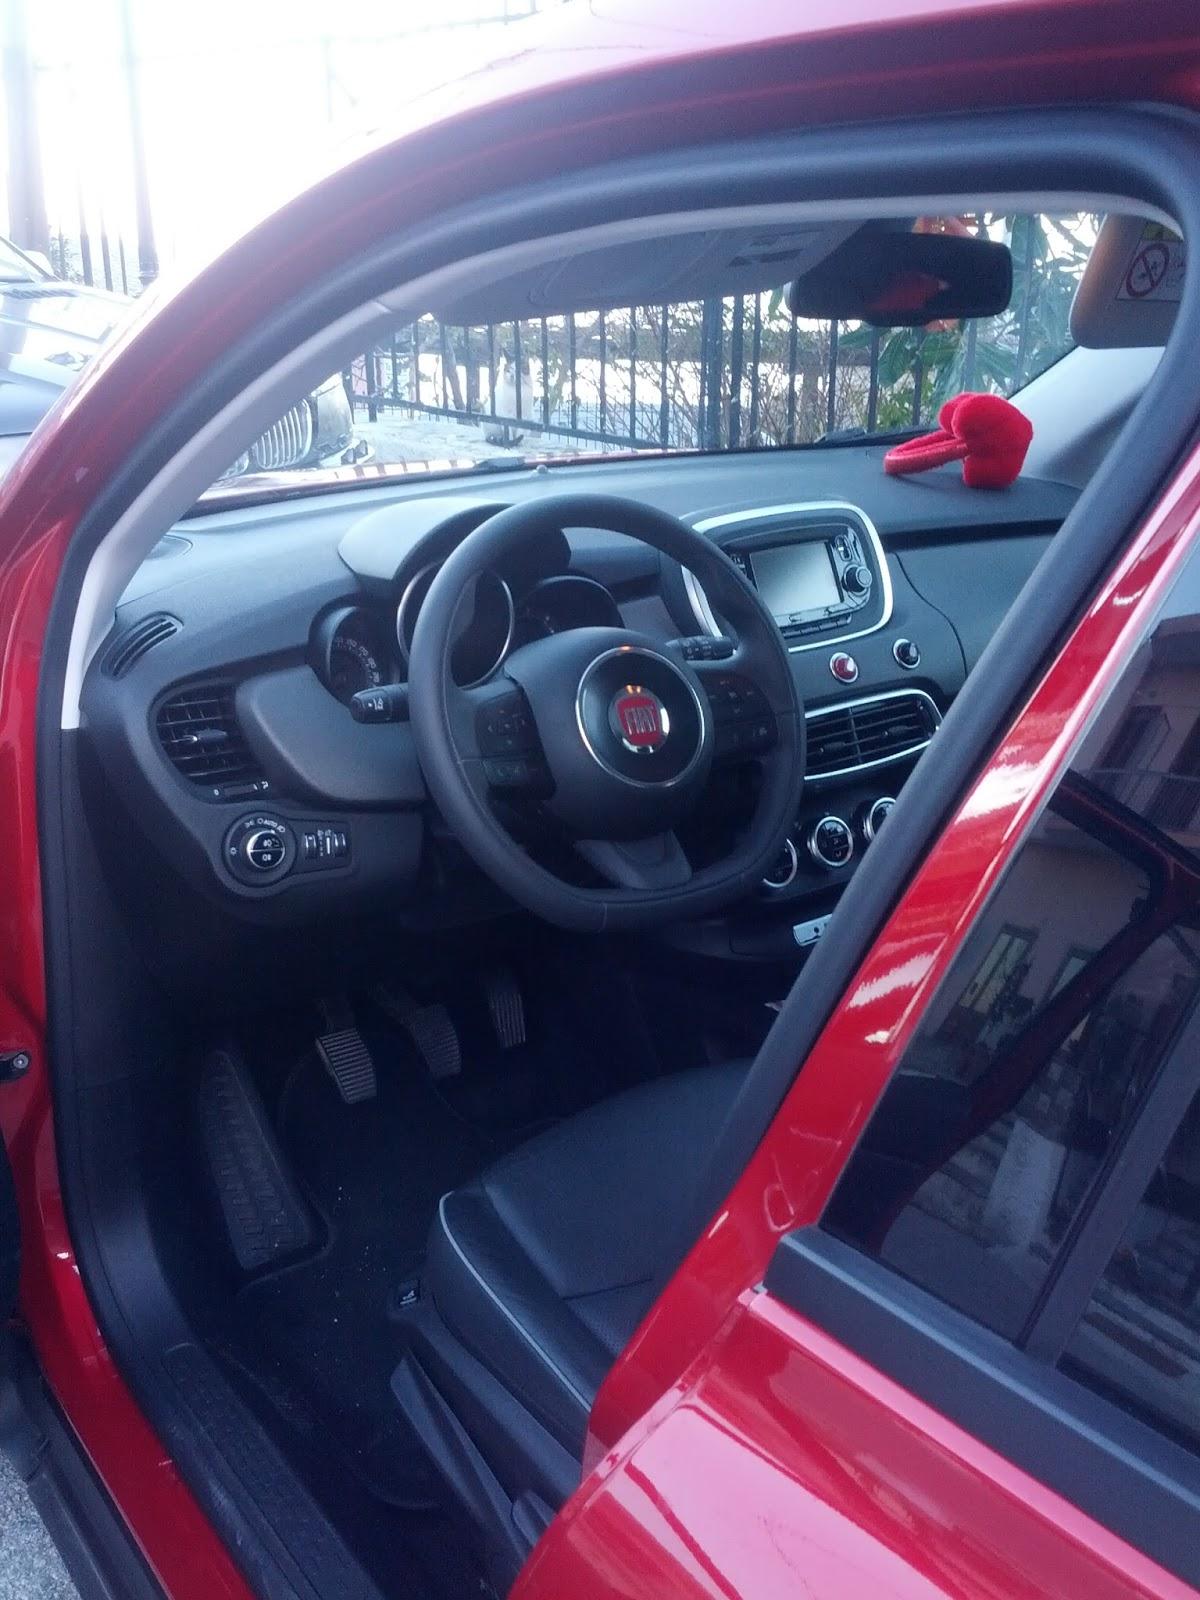 IMG 20151213 161949 Ταξιδεύω με το Fiat 500X στο παγωμένο Πήλιο compact SUV, Crossover, Fiat, Fiat 500X, SUV, TEST, zblog, ΔΟΚΙΜΕΣ, Ταξίδι